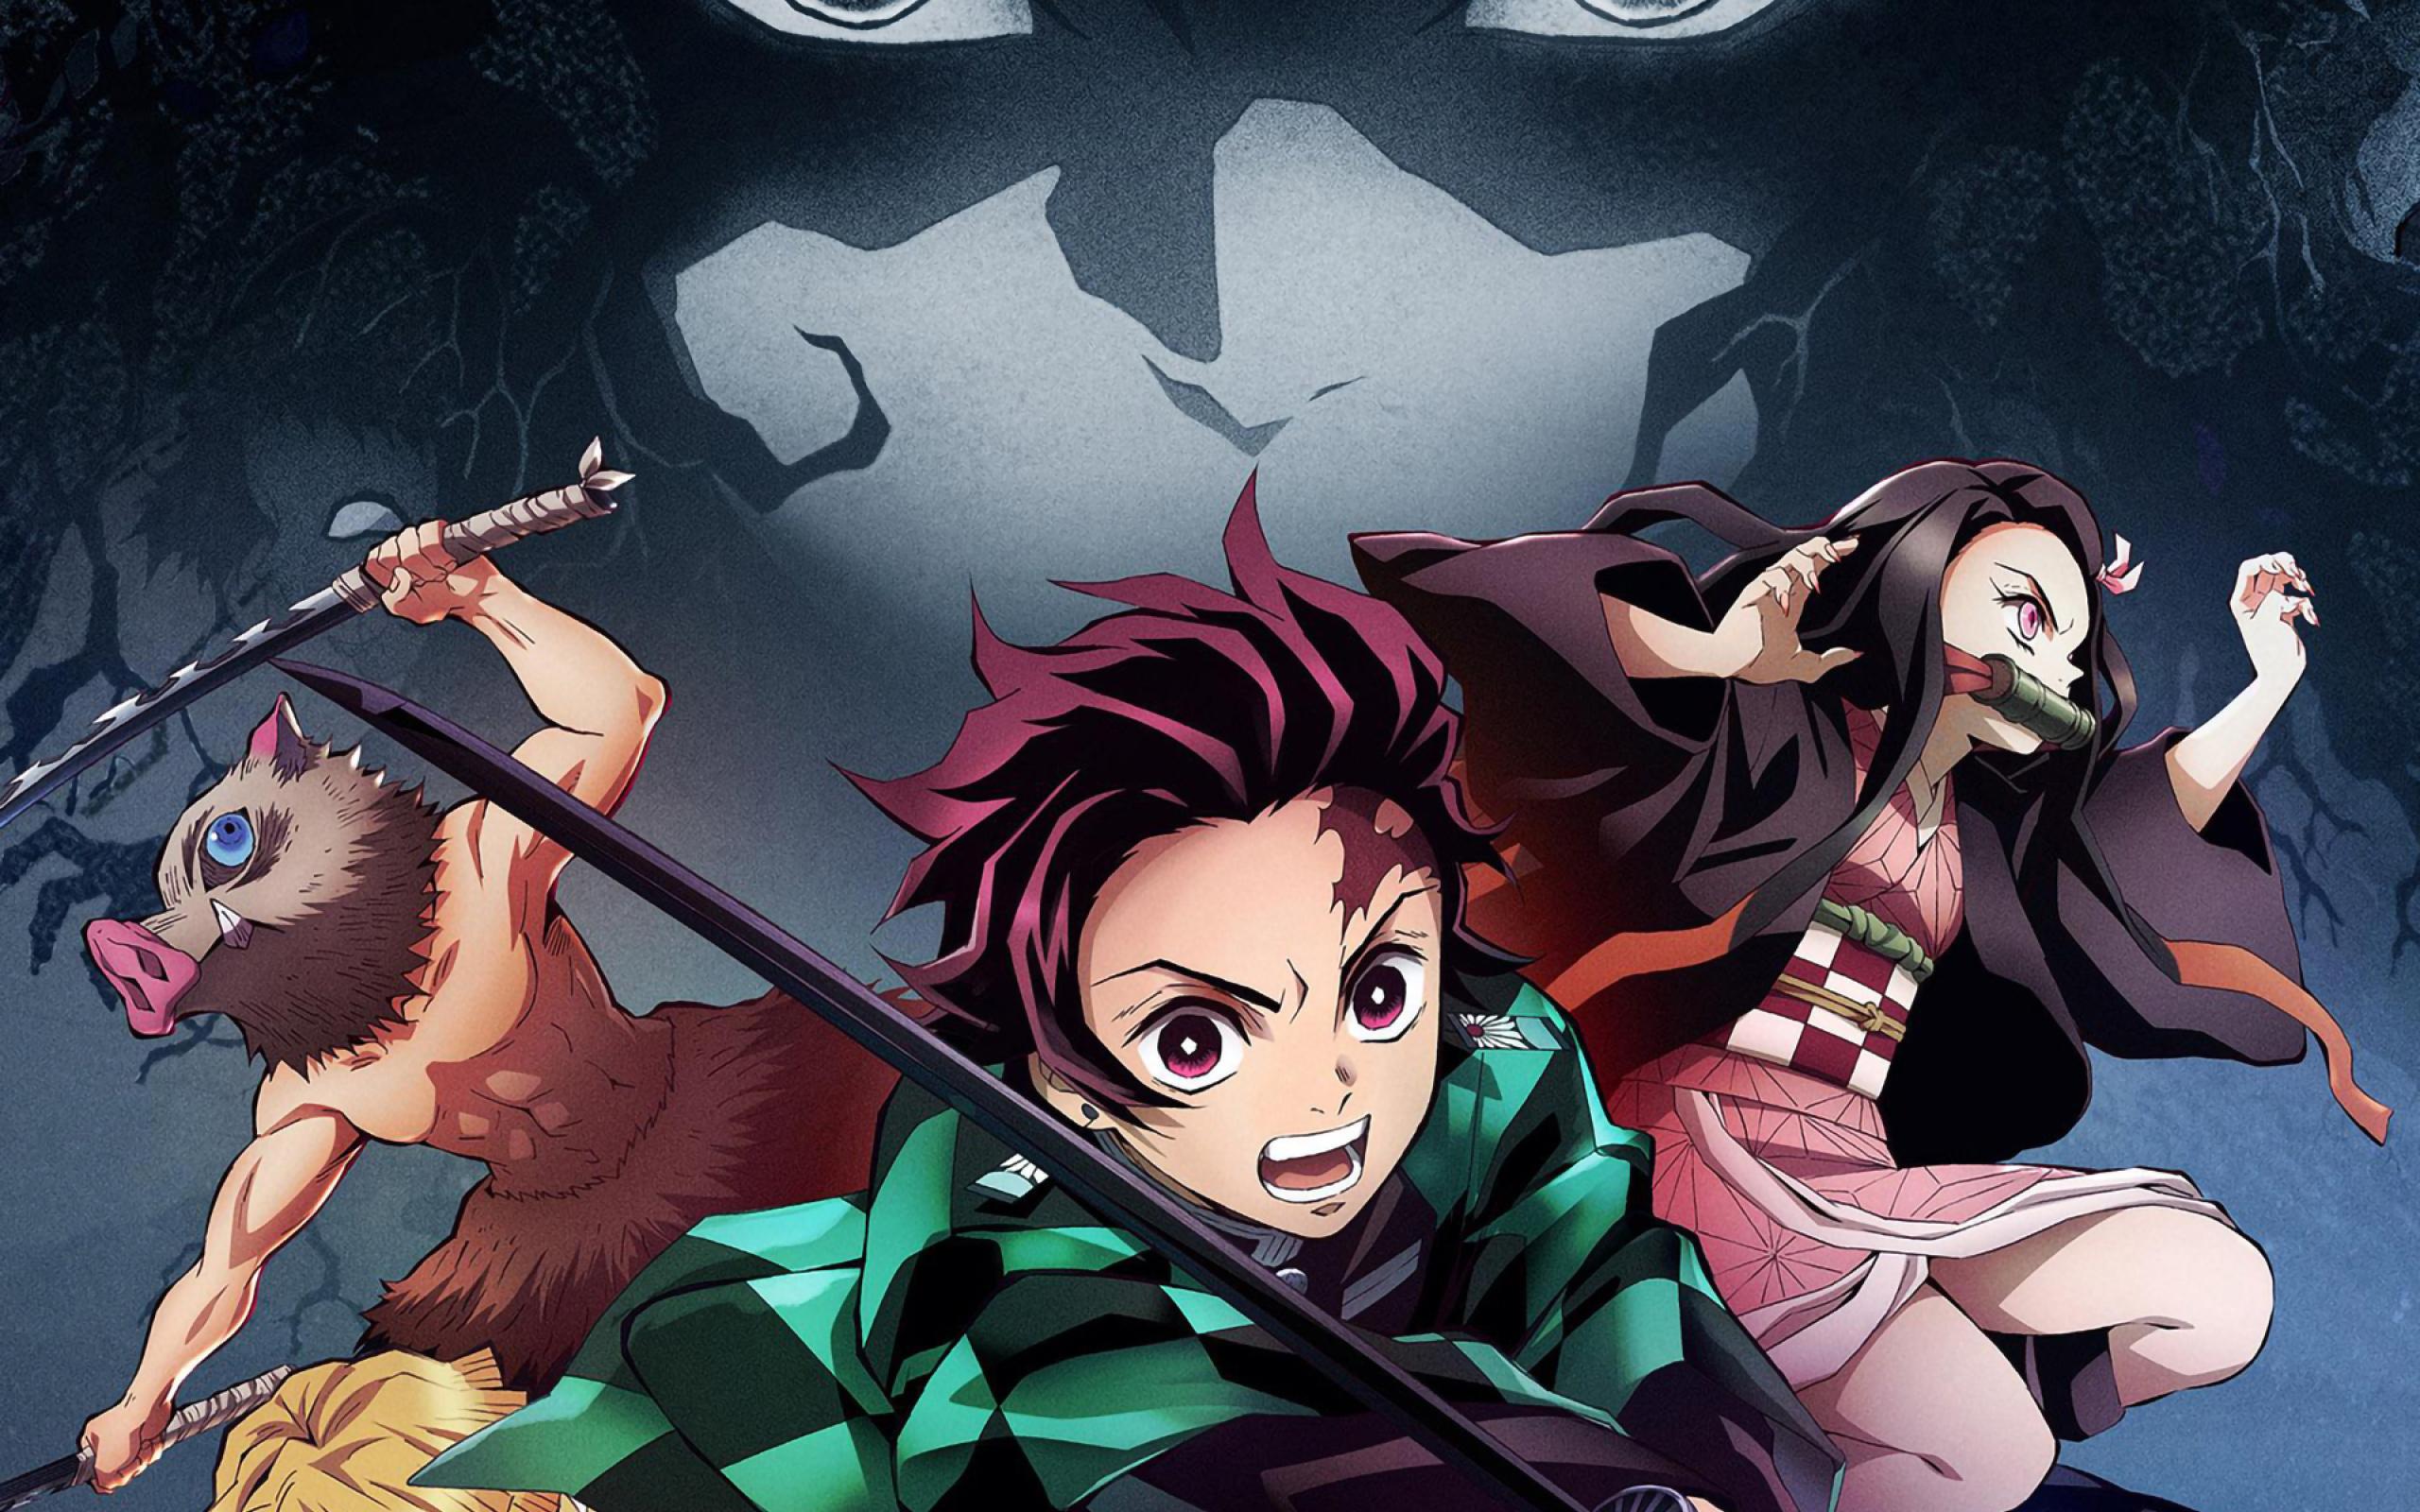 2560x1600 Demon Slayer 2560x1600 Resolution Wallpaper Hd Anime 4k